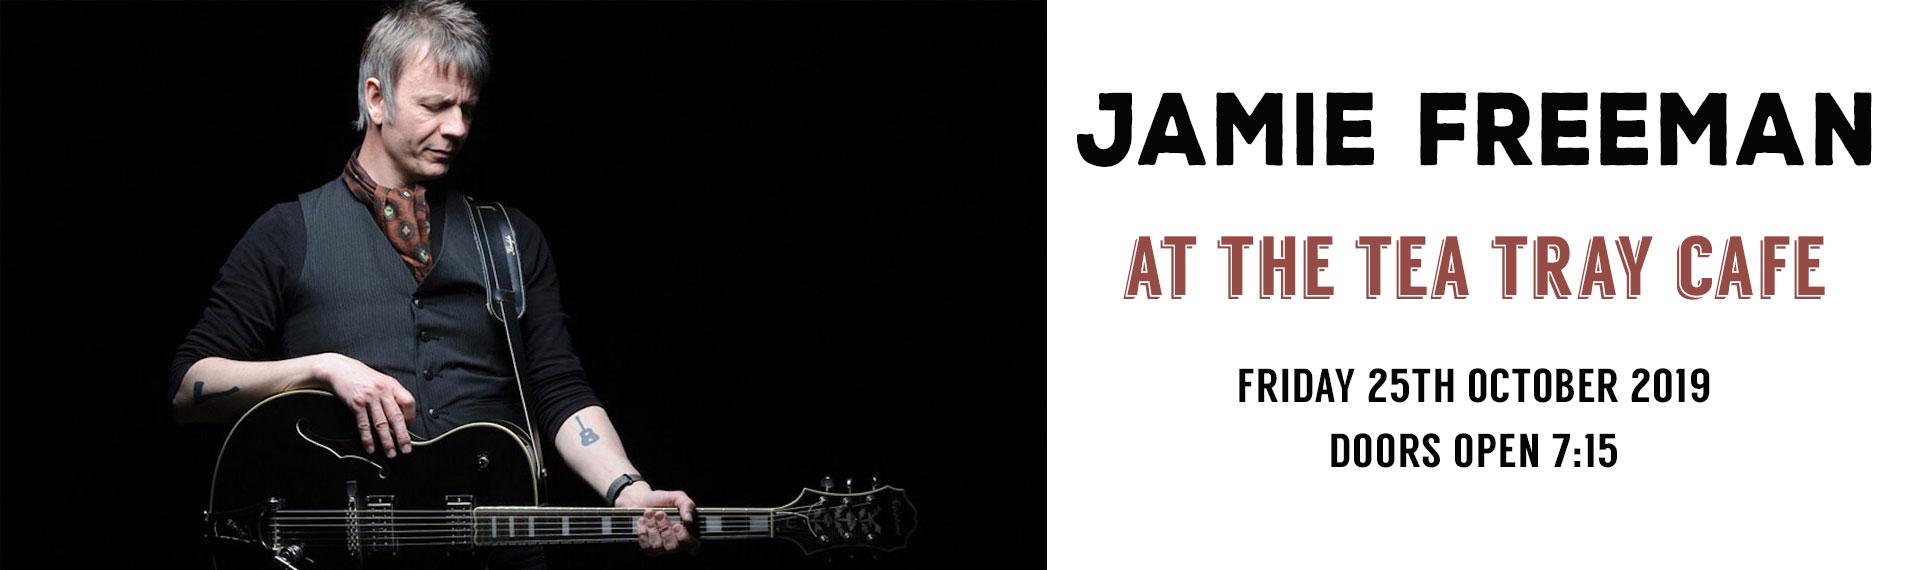 JAMIE-FREEMAN2019BANNER